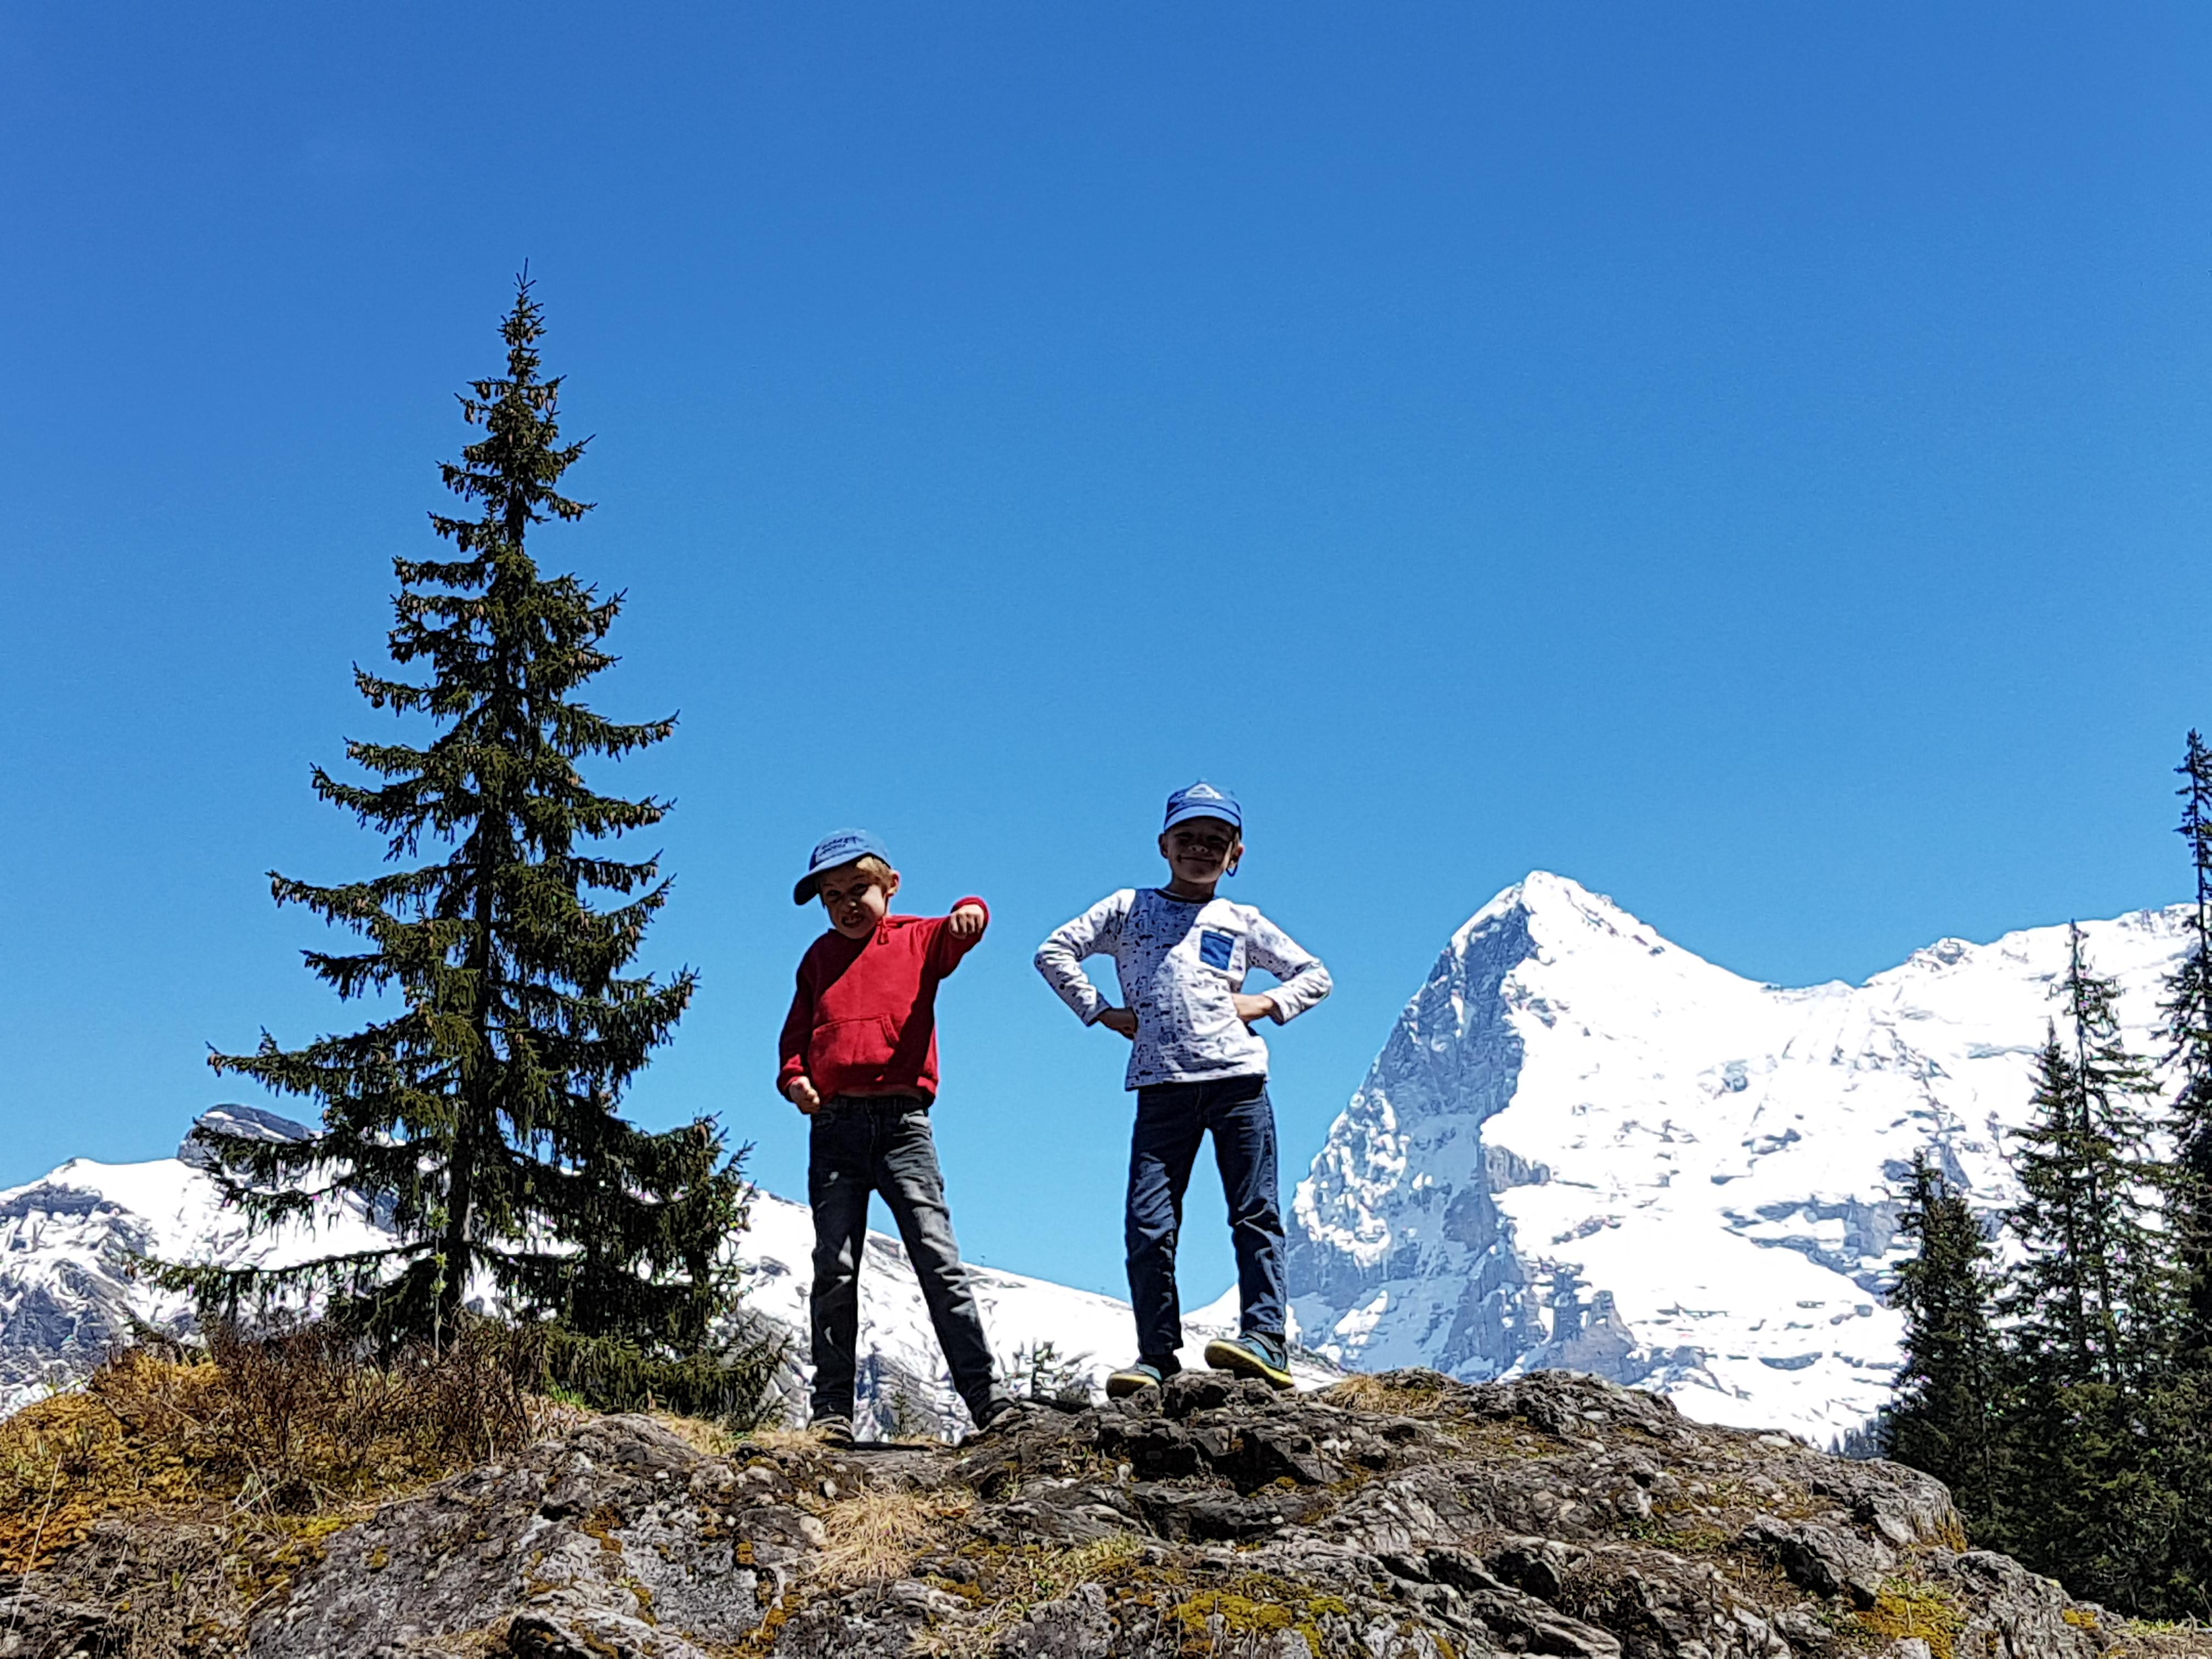 Fun on the alpine trails